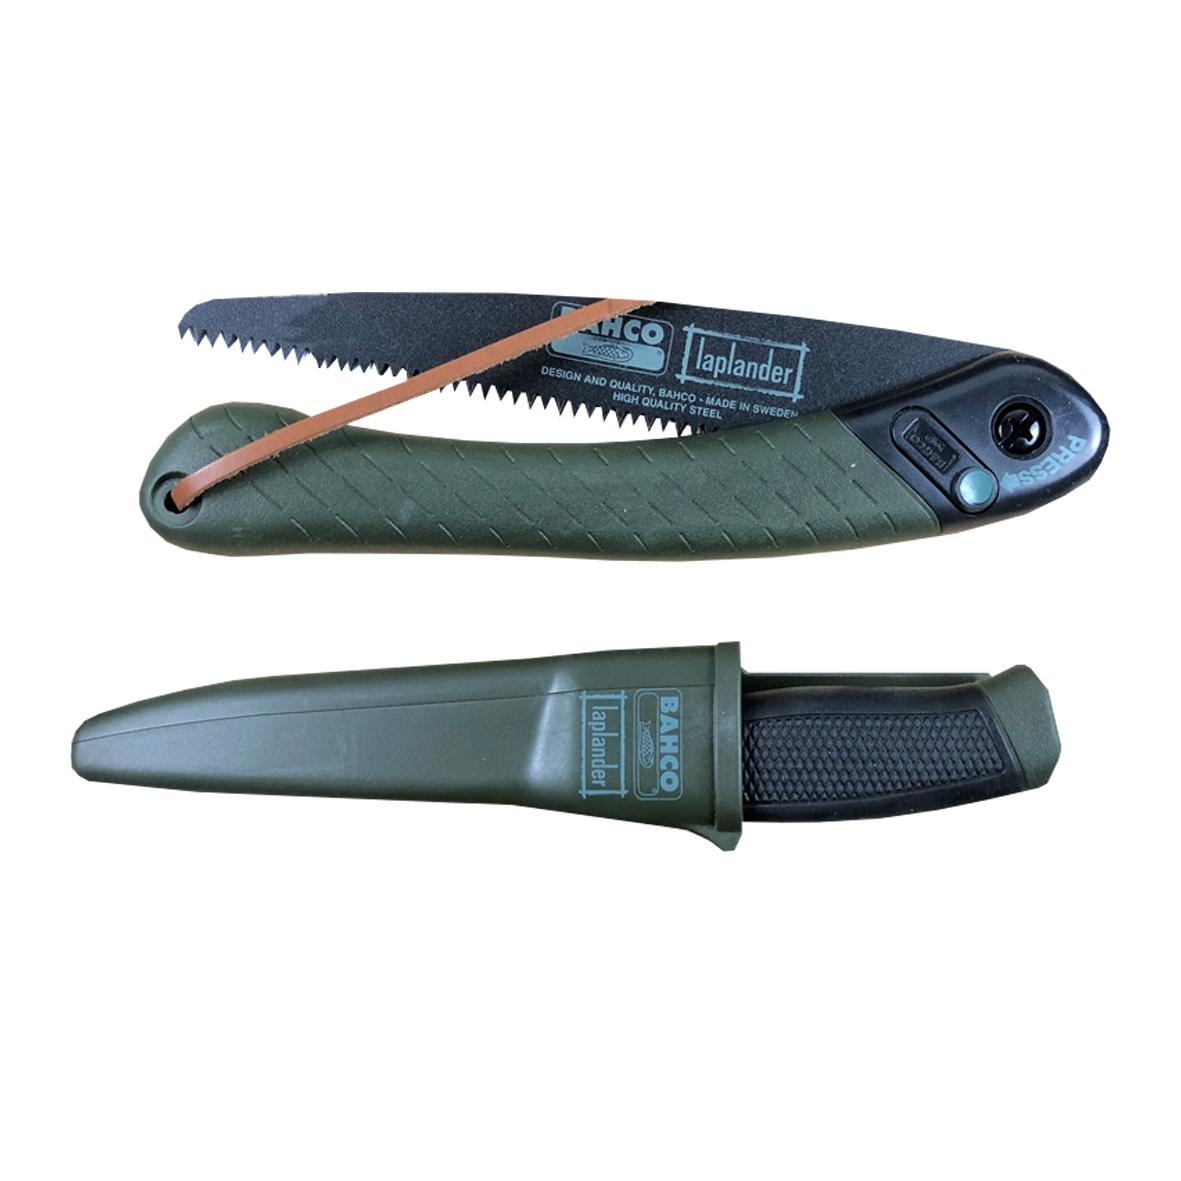 Bahco Foldable Saw and Knife Set